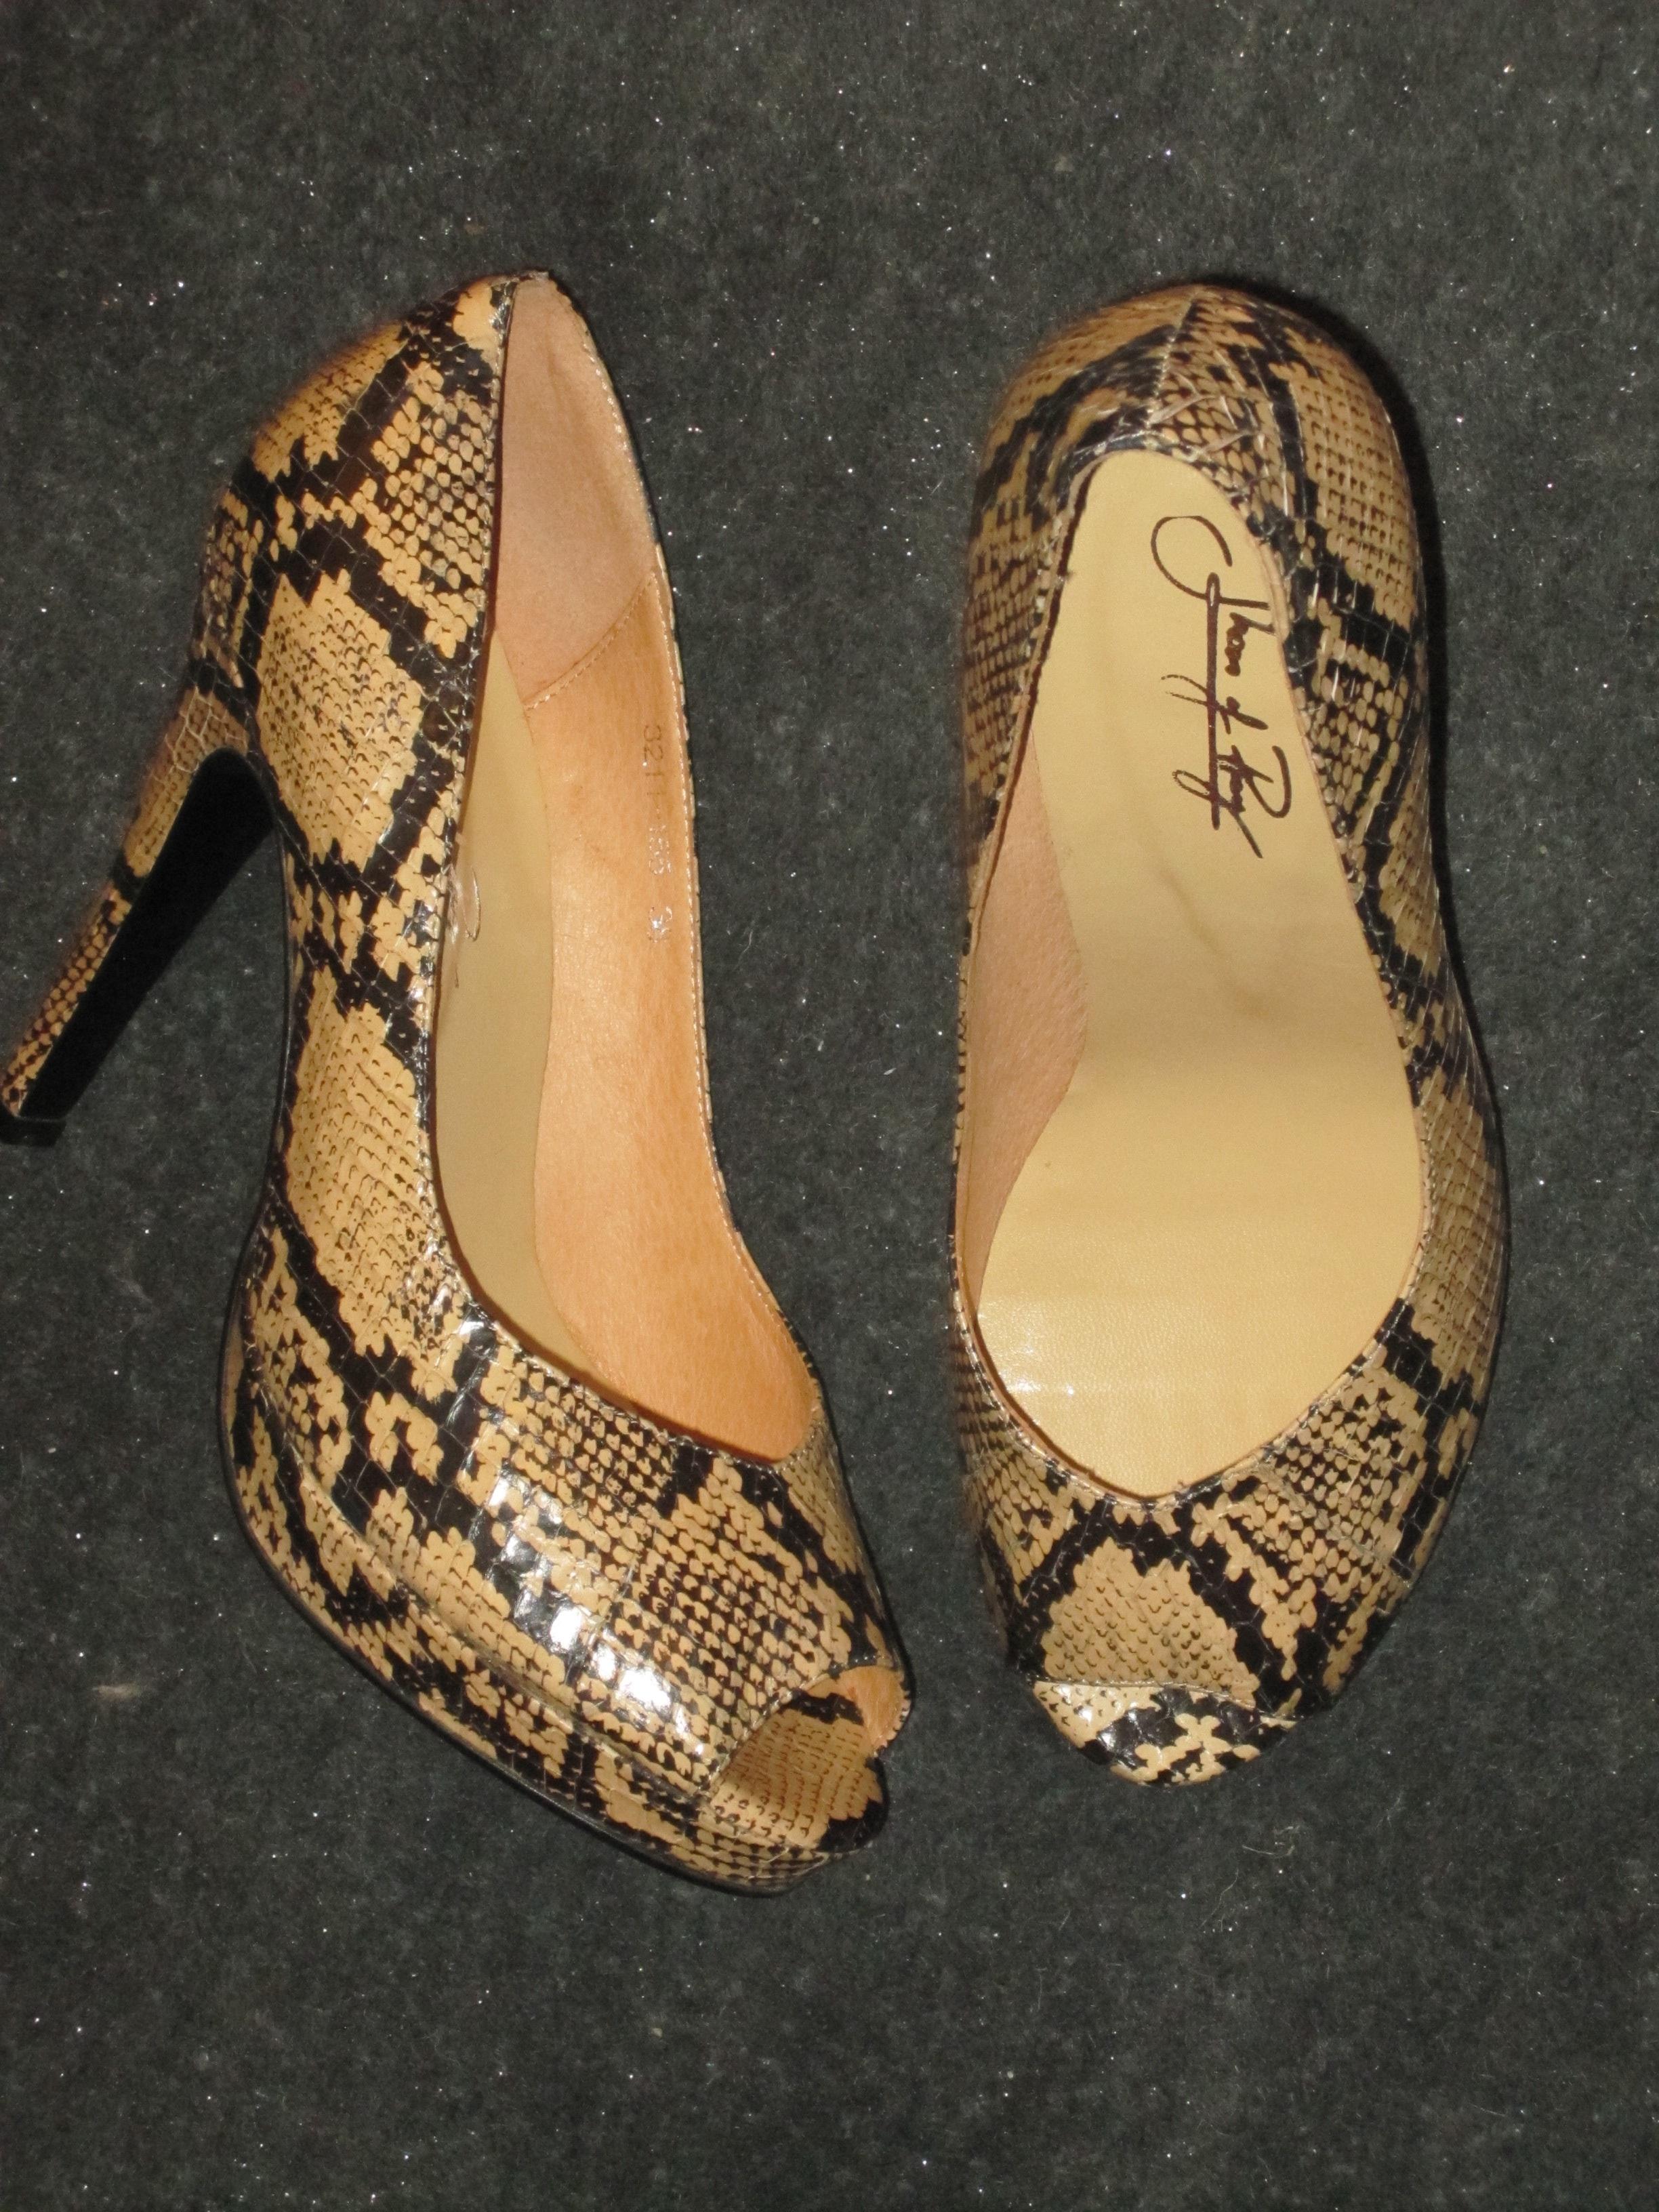 Shoes Of Prey Ballet Flats Review